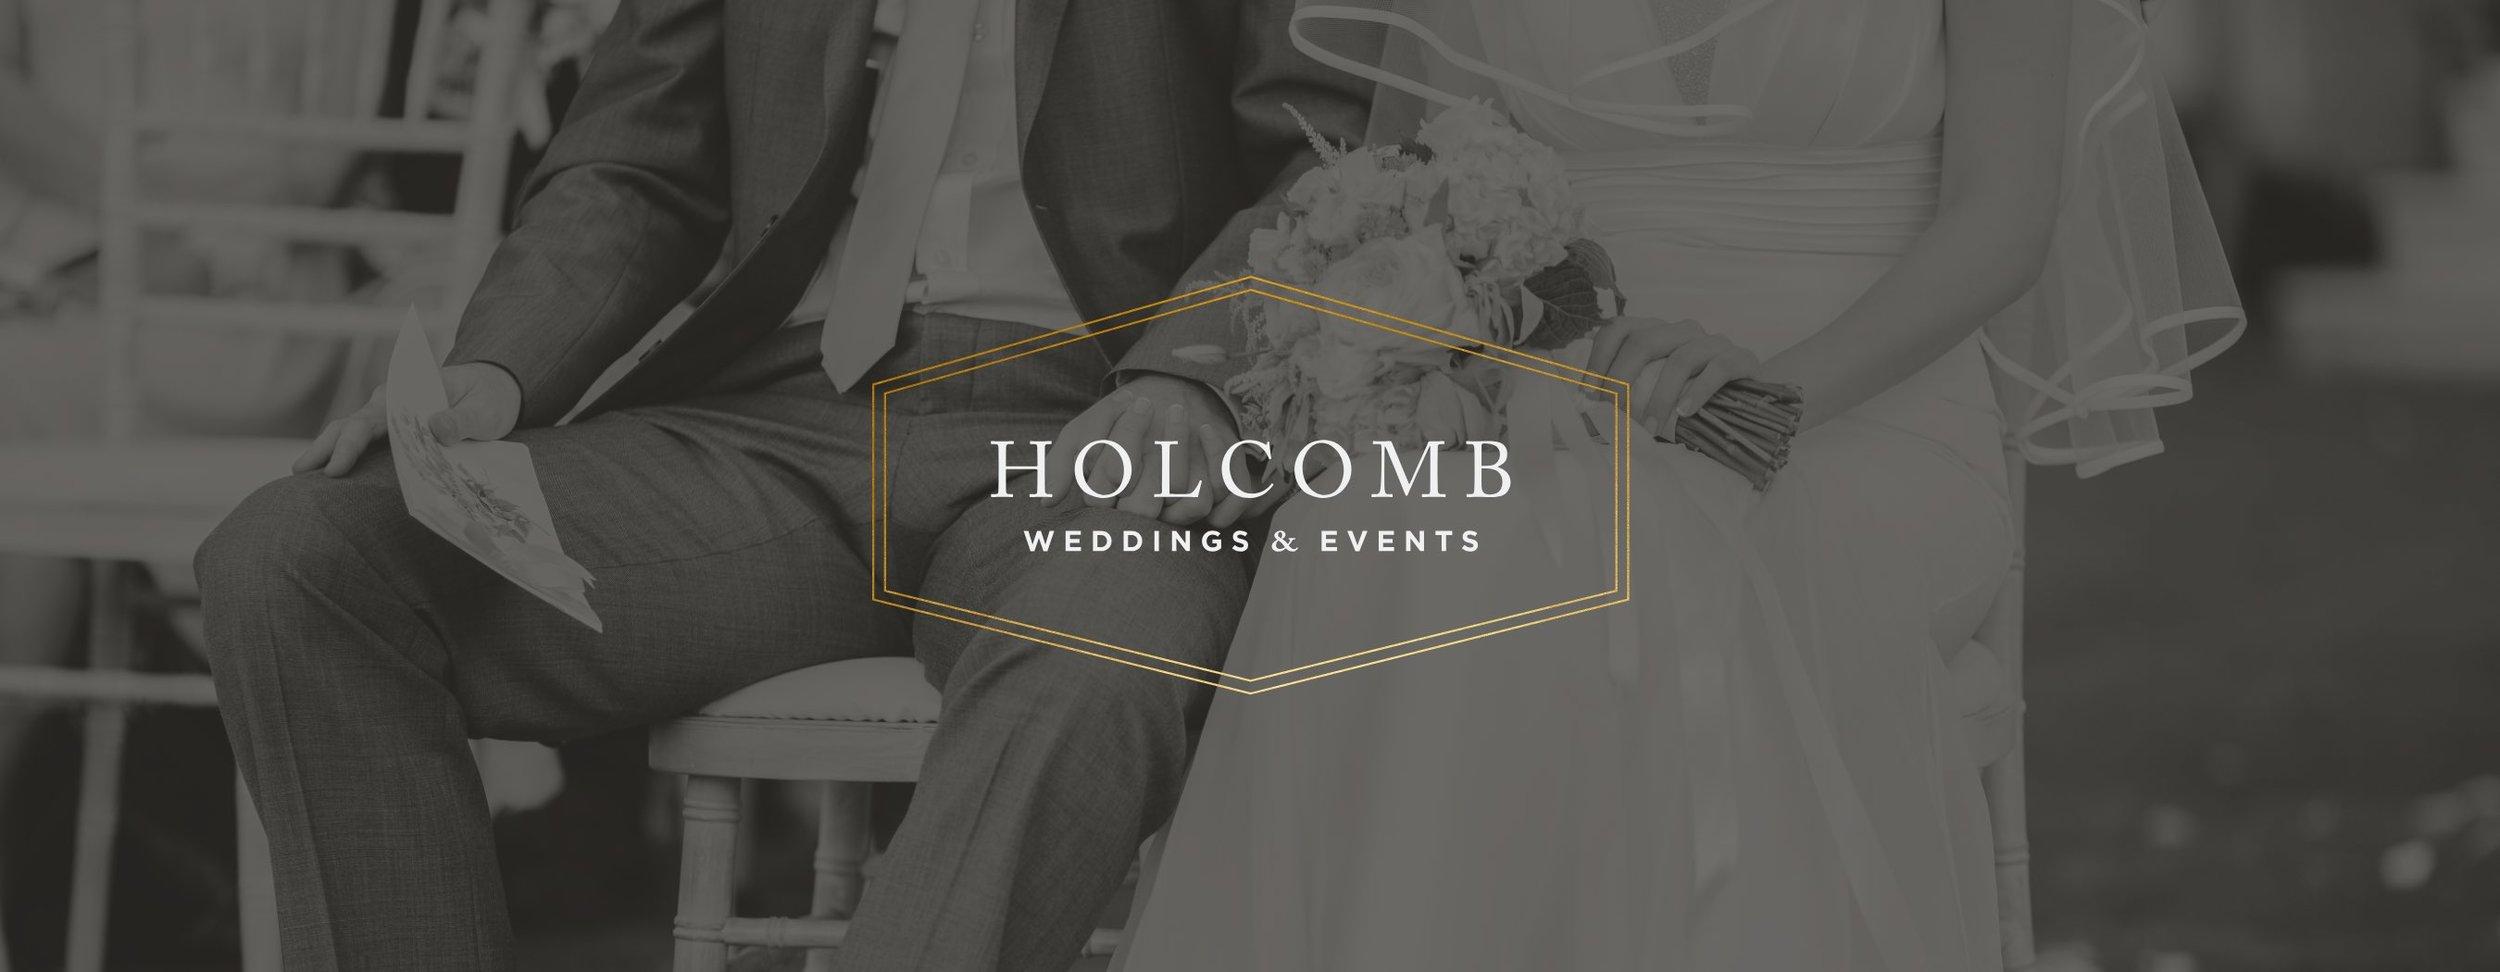 Holcomb Weddings & Events | Logo Design | Samantha Madeo Design